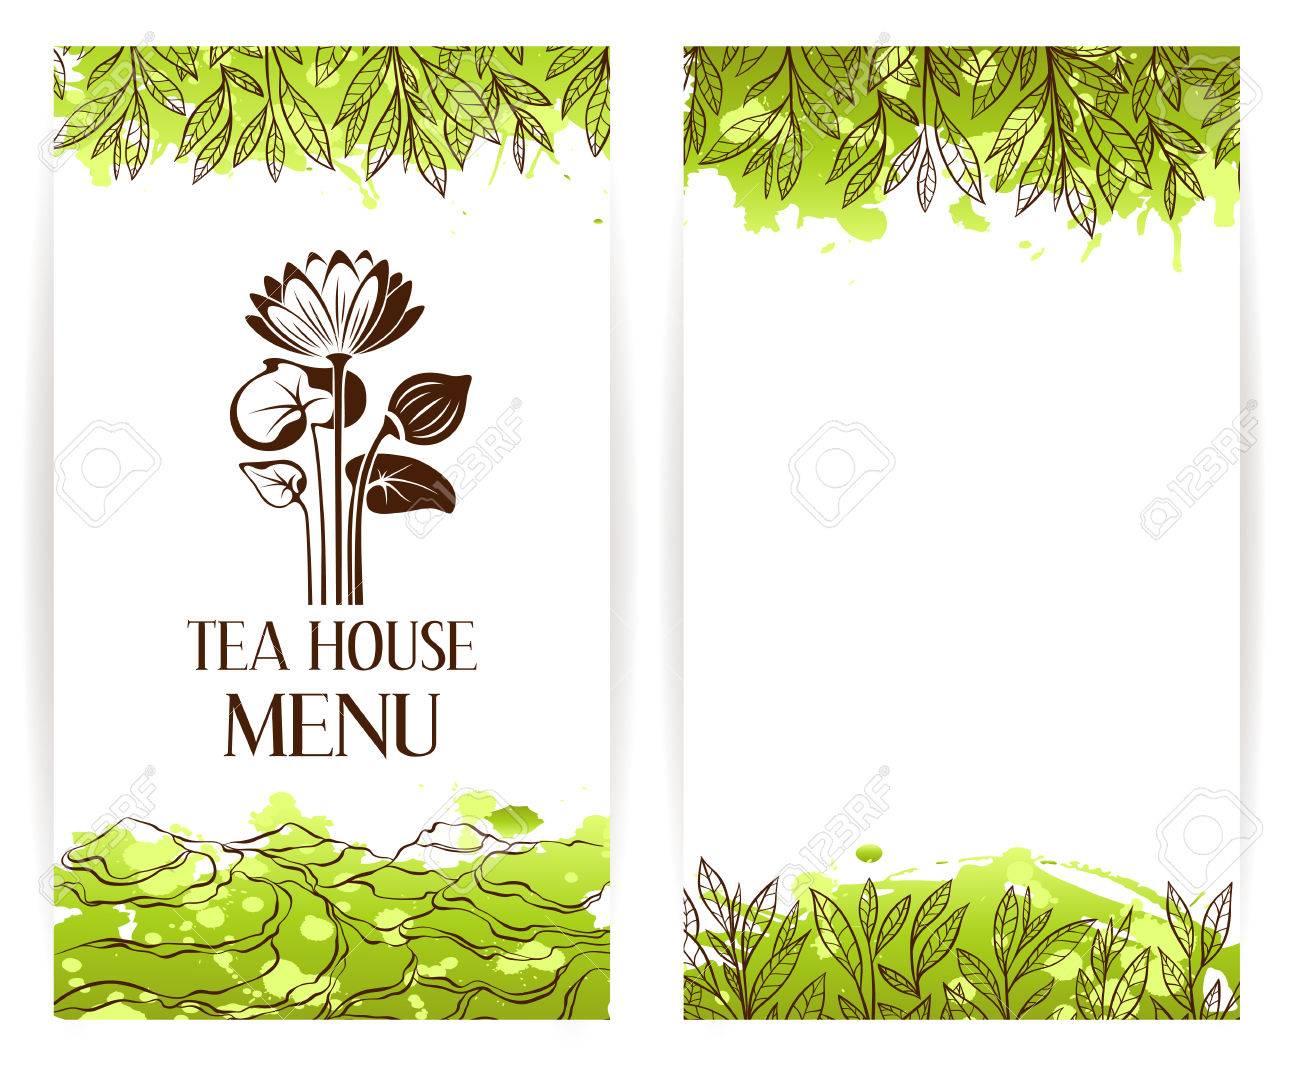 Green Tea Menu Template Lotus Flouwer Logo Tea Banner Collection Royalty Free Cliparts Vectors And Stock Illustration Image 62599827